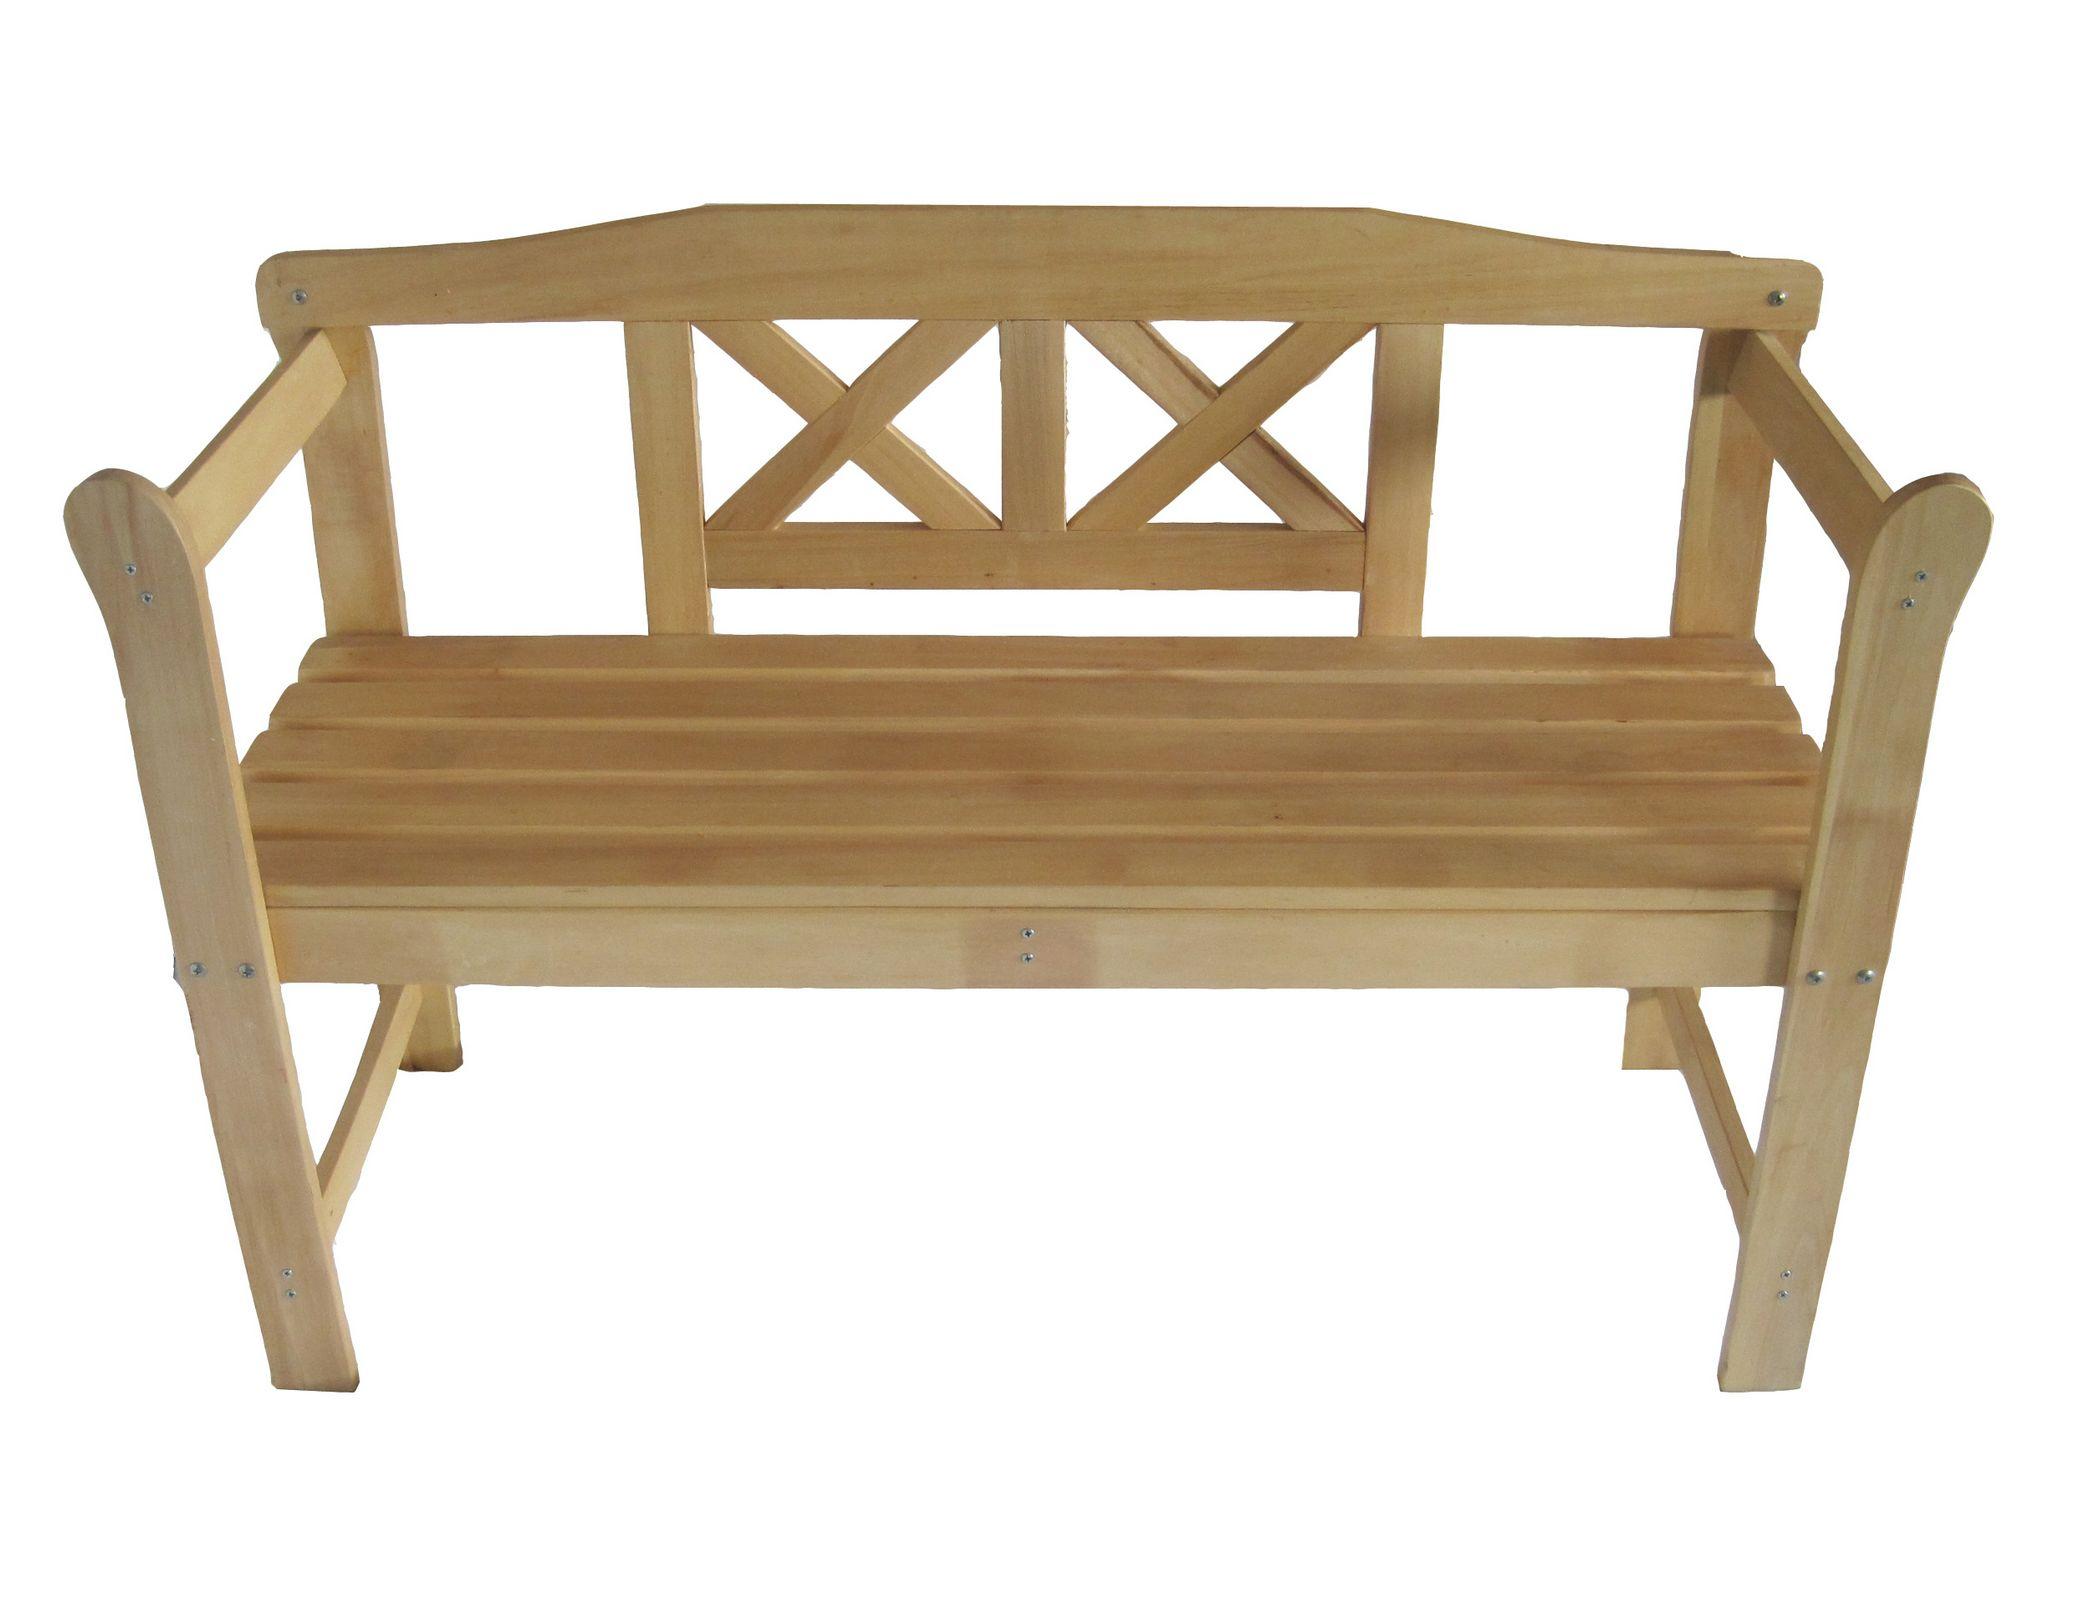 Outdoor Home Wooden 2 Seat Seater Garden Bench Furniture